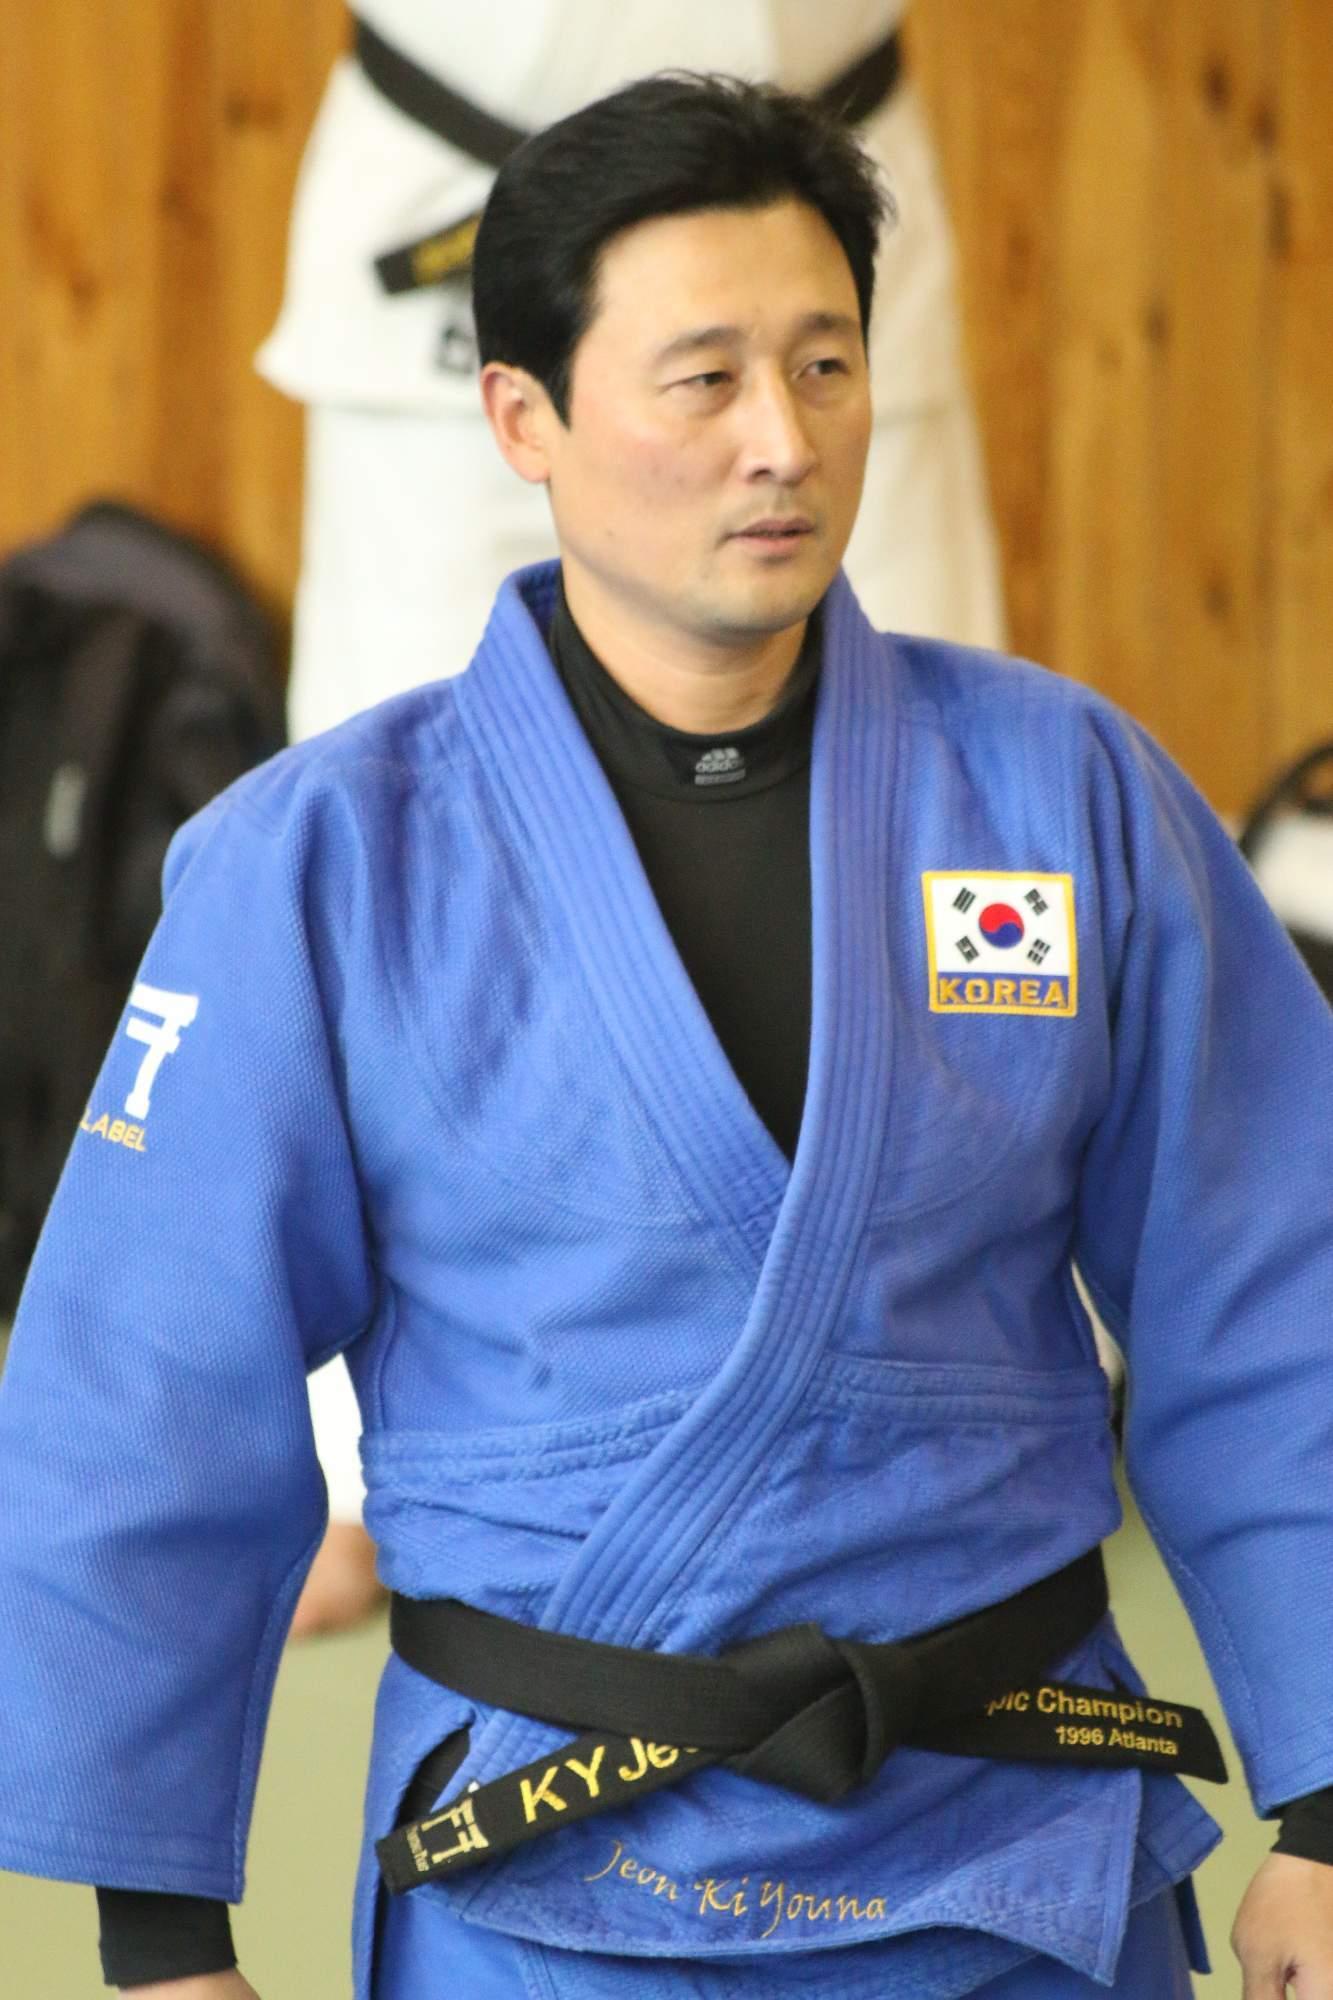 Олимпийские чемпионы по дзюдо. Южная Корея Jeon Ki-young.